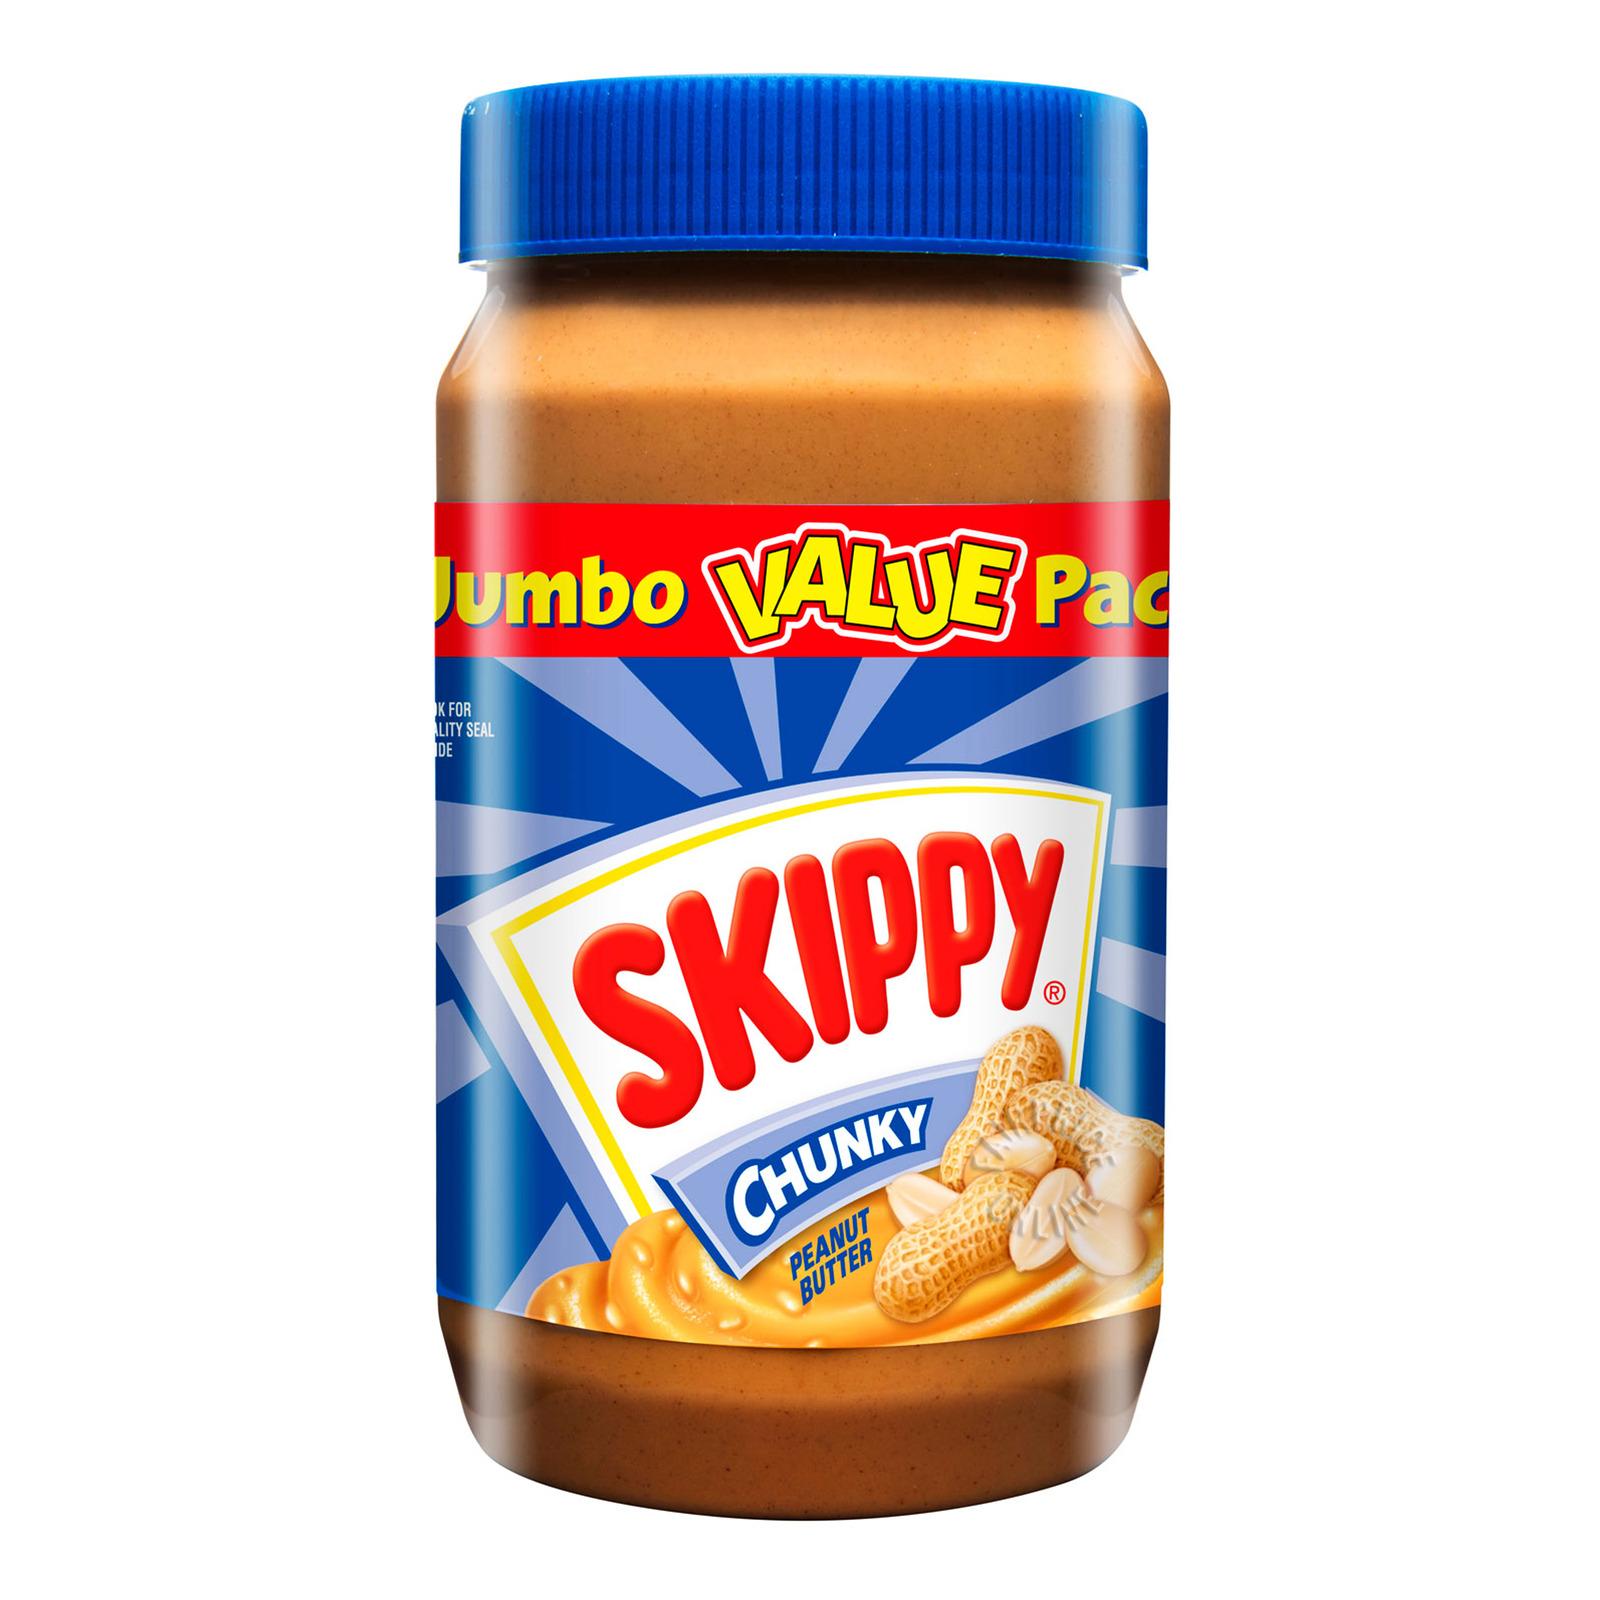 Skippy Peanut Butter Spread - Chunky